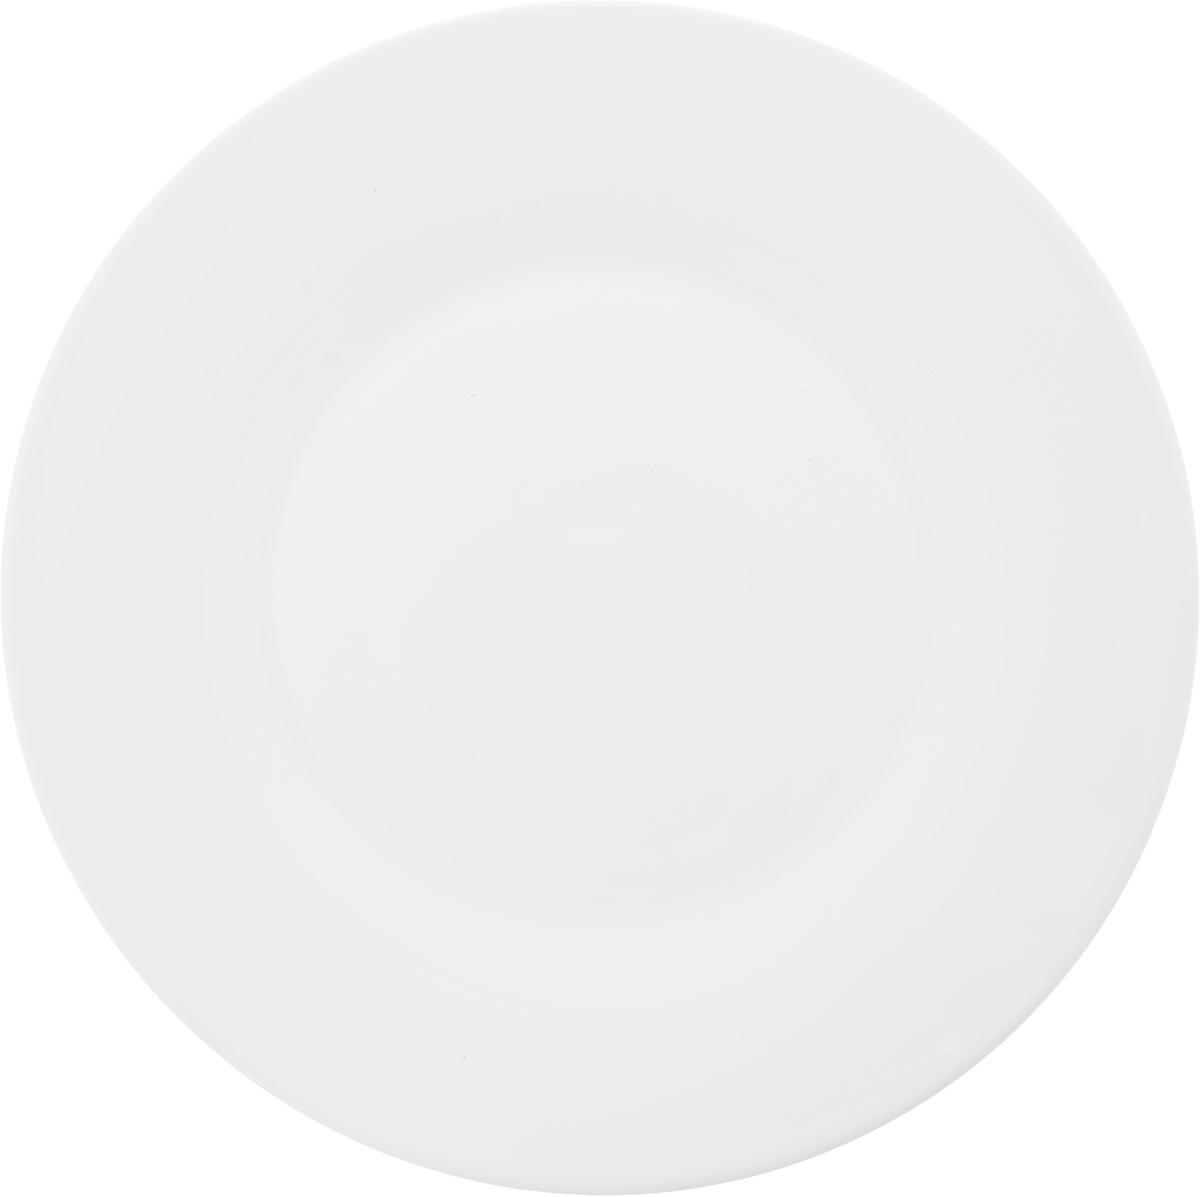 Тарелка обеденная Luminarc Alizee, диаметр 28 см тарелка суповая luminarc alizee 23 см